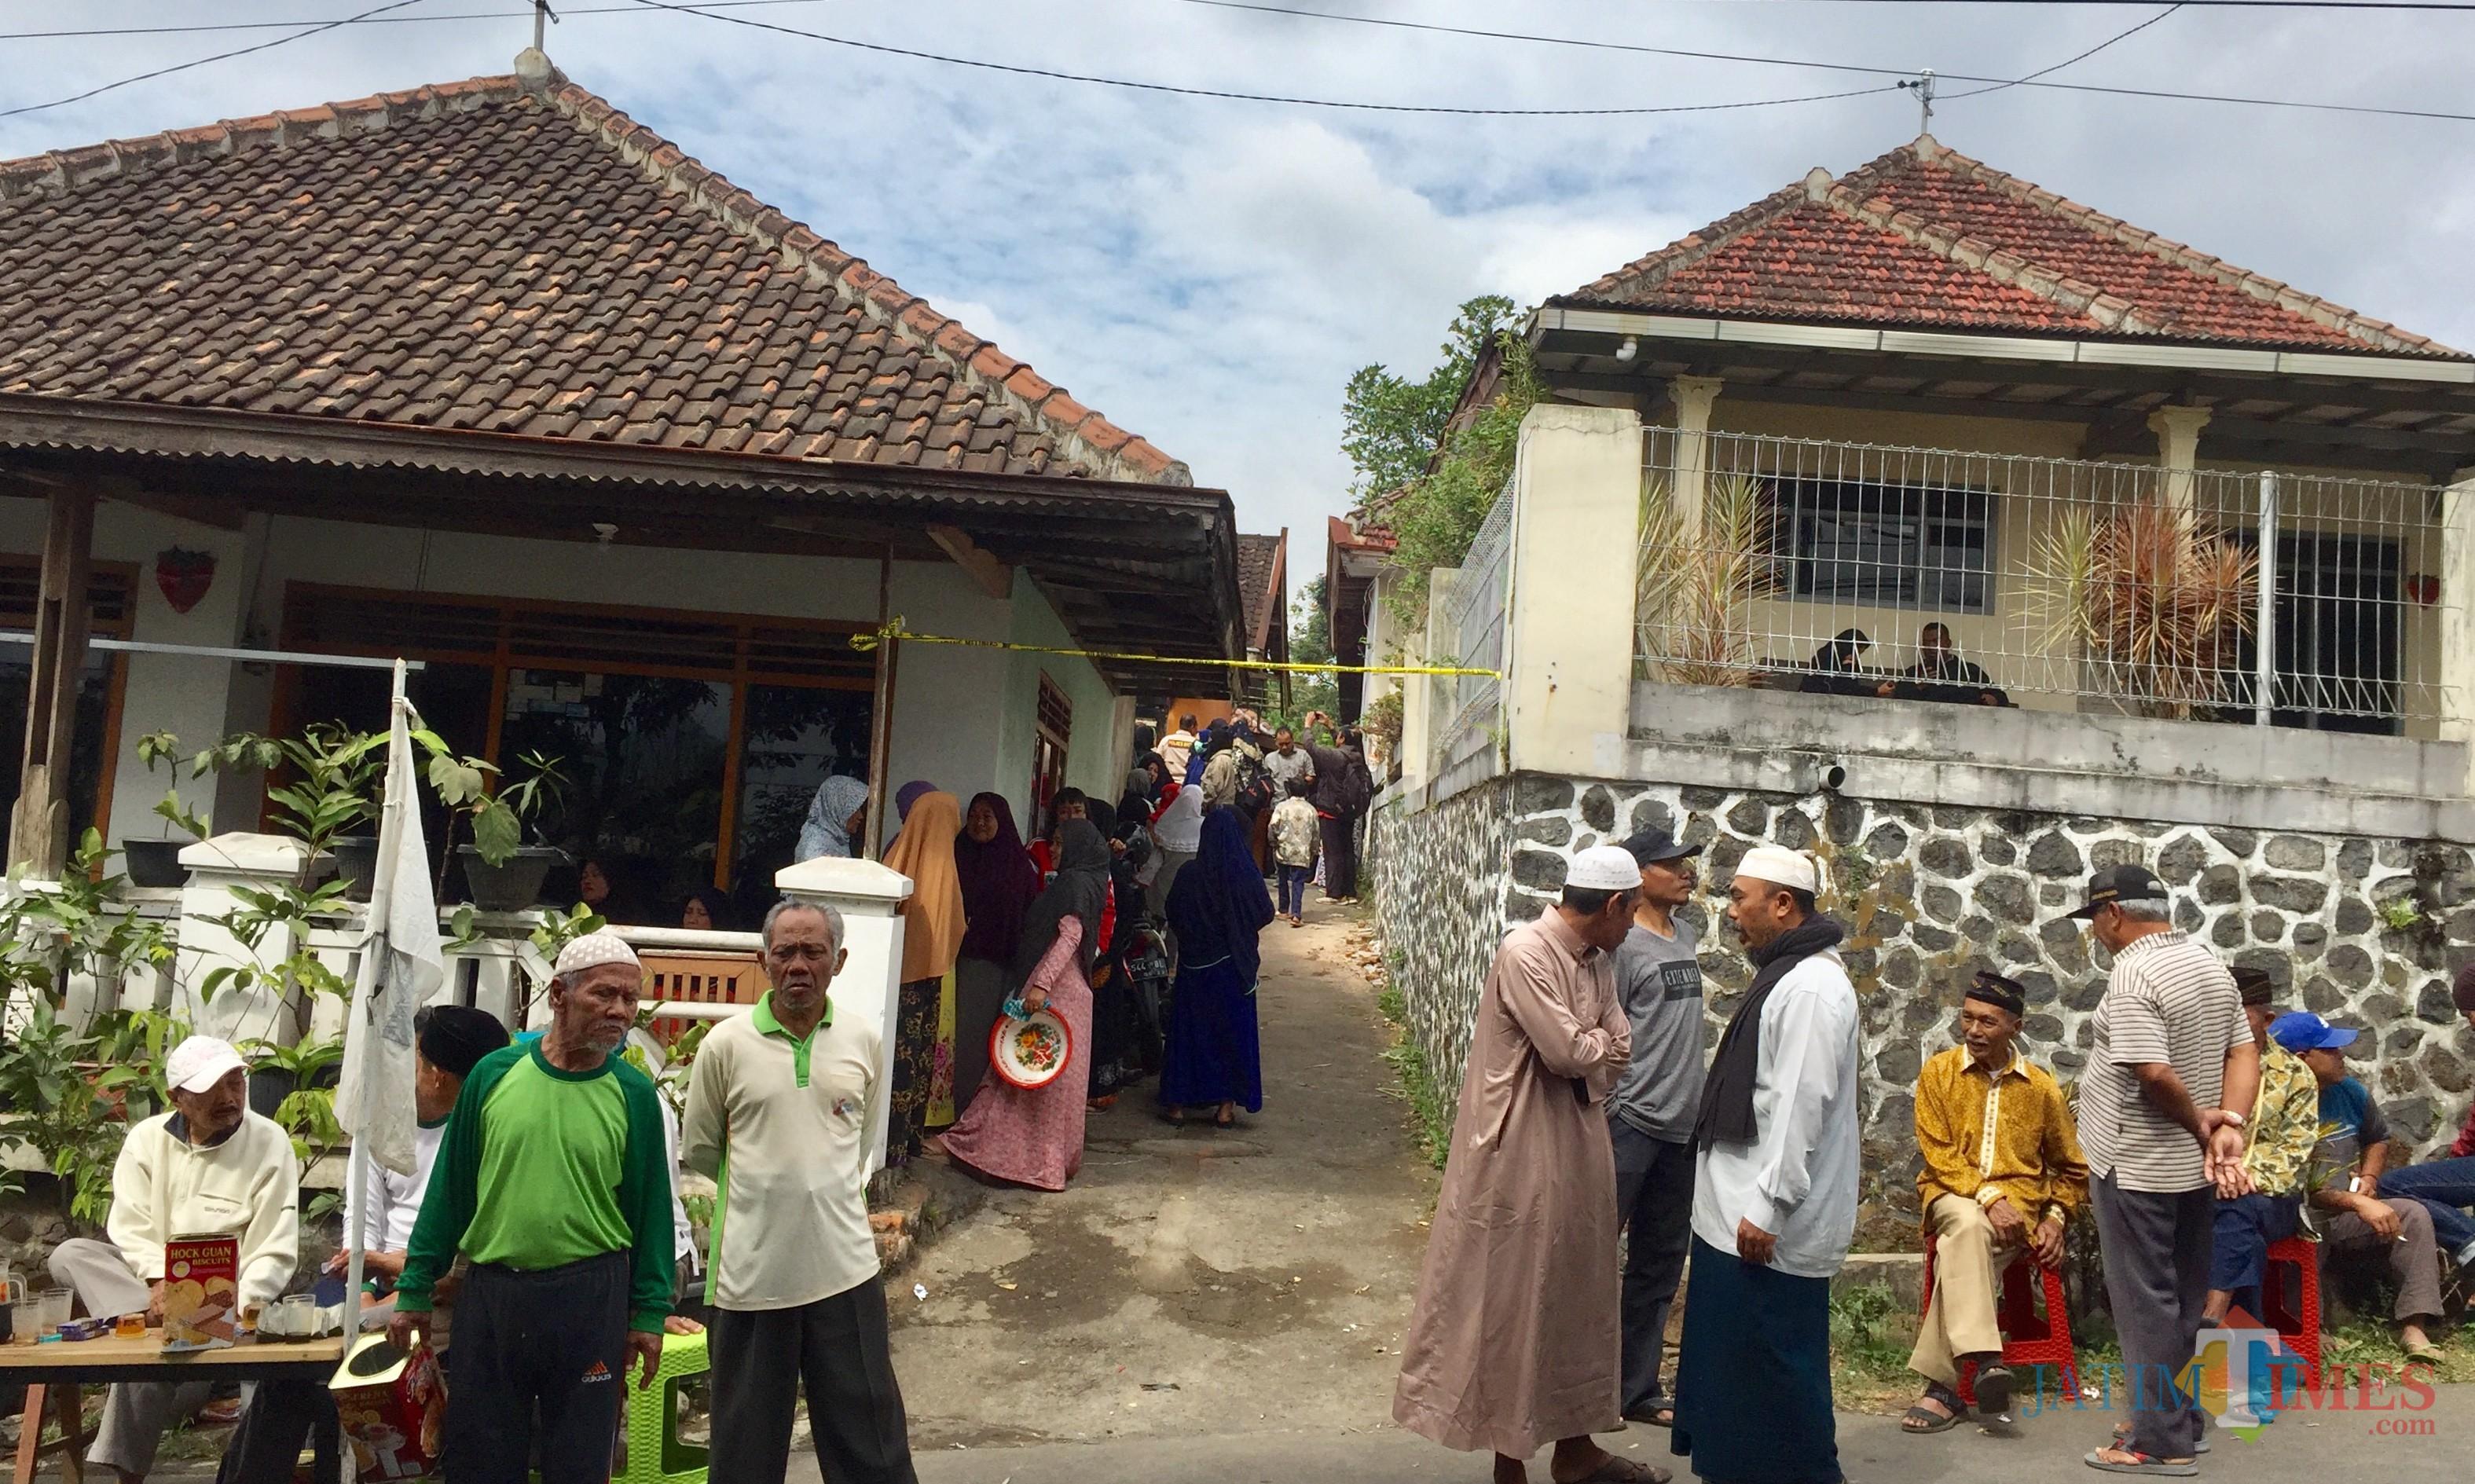 Suasana di area rumah duka Jalan Hasanudin No 35A RT 02 RW 05, Desa Junrejo, Kecamatan Junrejo, Kota Batu, Rabu (24/7/2019). (Foto: Irsya Richa/MalangTIMES)